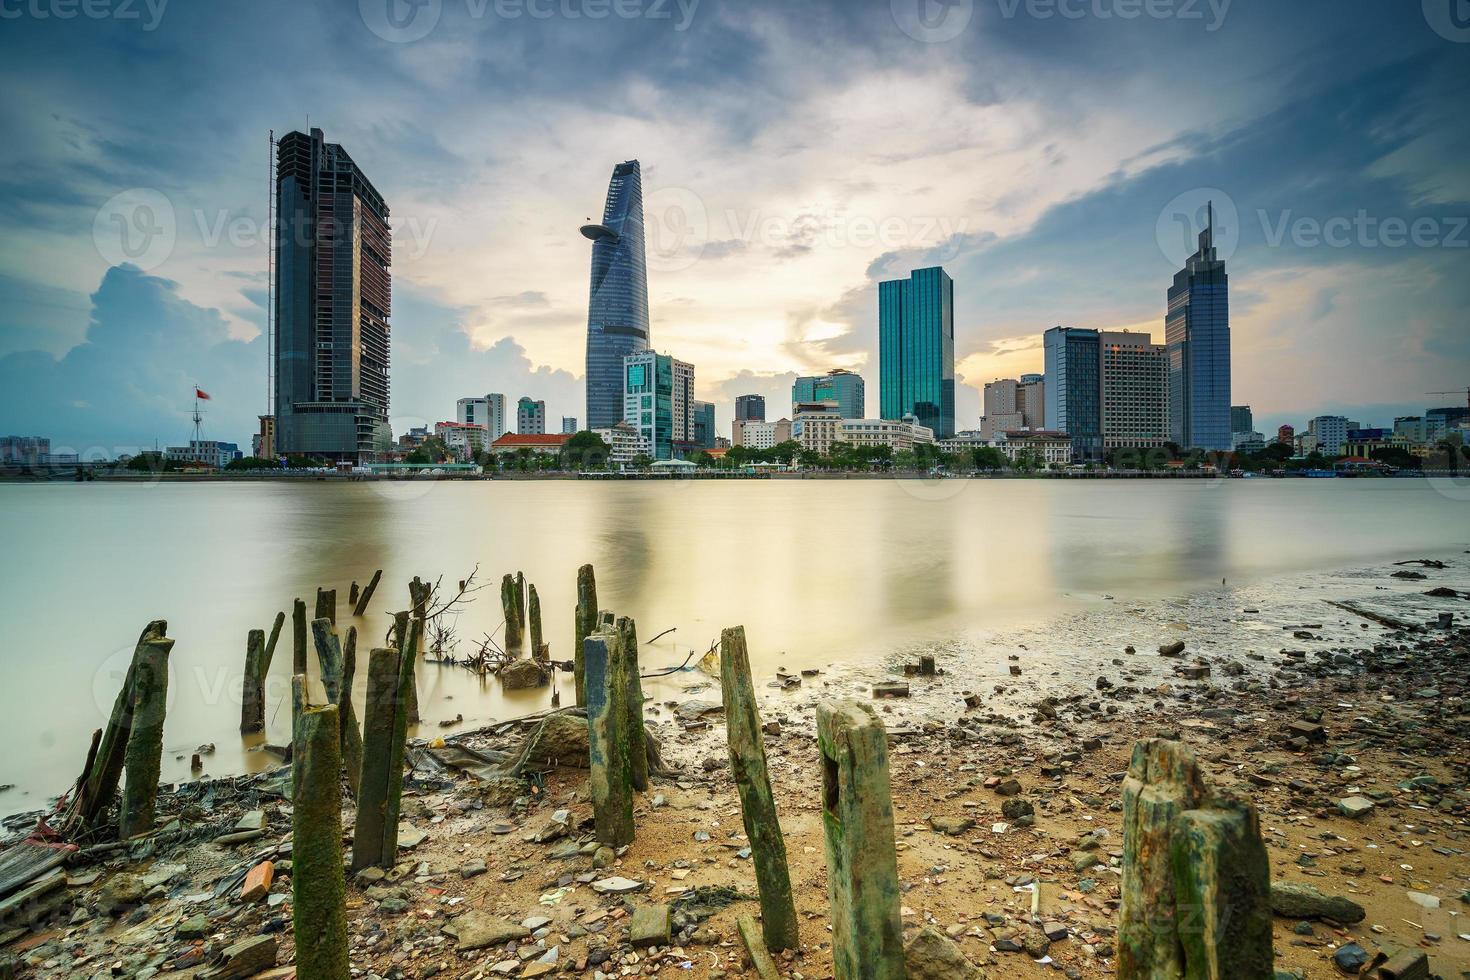 het centrum van saigon in zonsondergang (hdr), ho chi minh city, vietnam foto